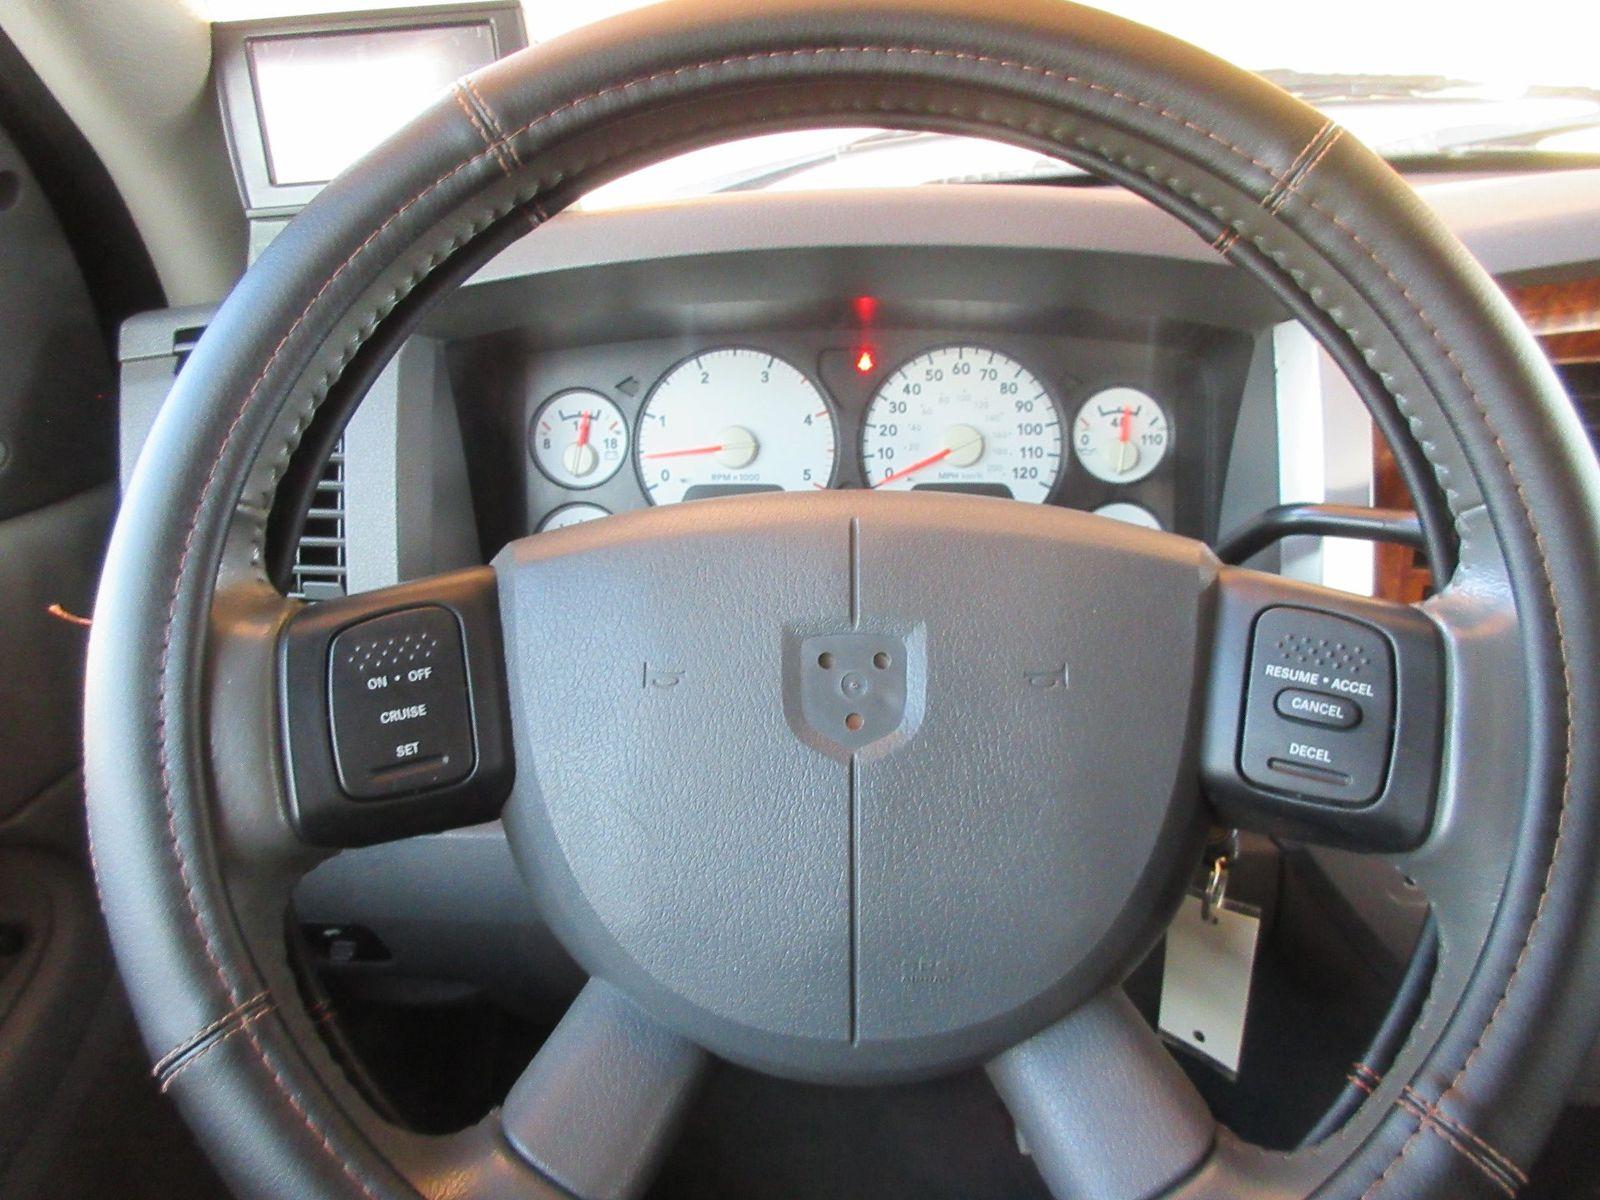 2006 Dodge Ram 2500 Laramie Fultons Used Cars Inc 360 Wiring Tach In Colorado